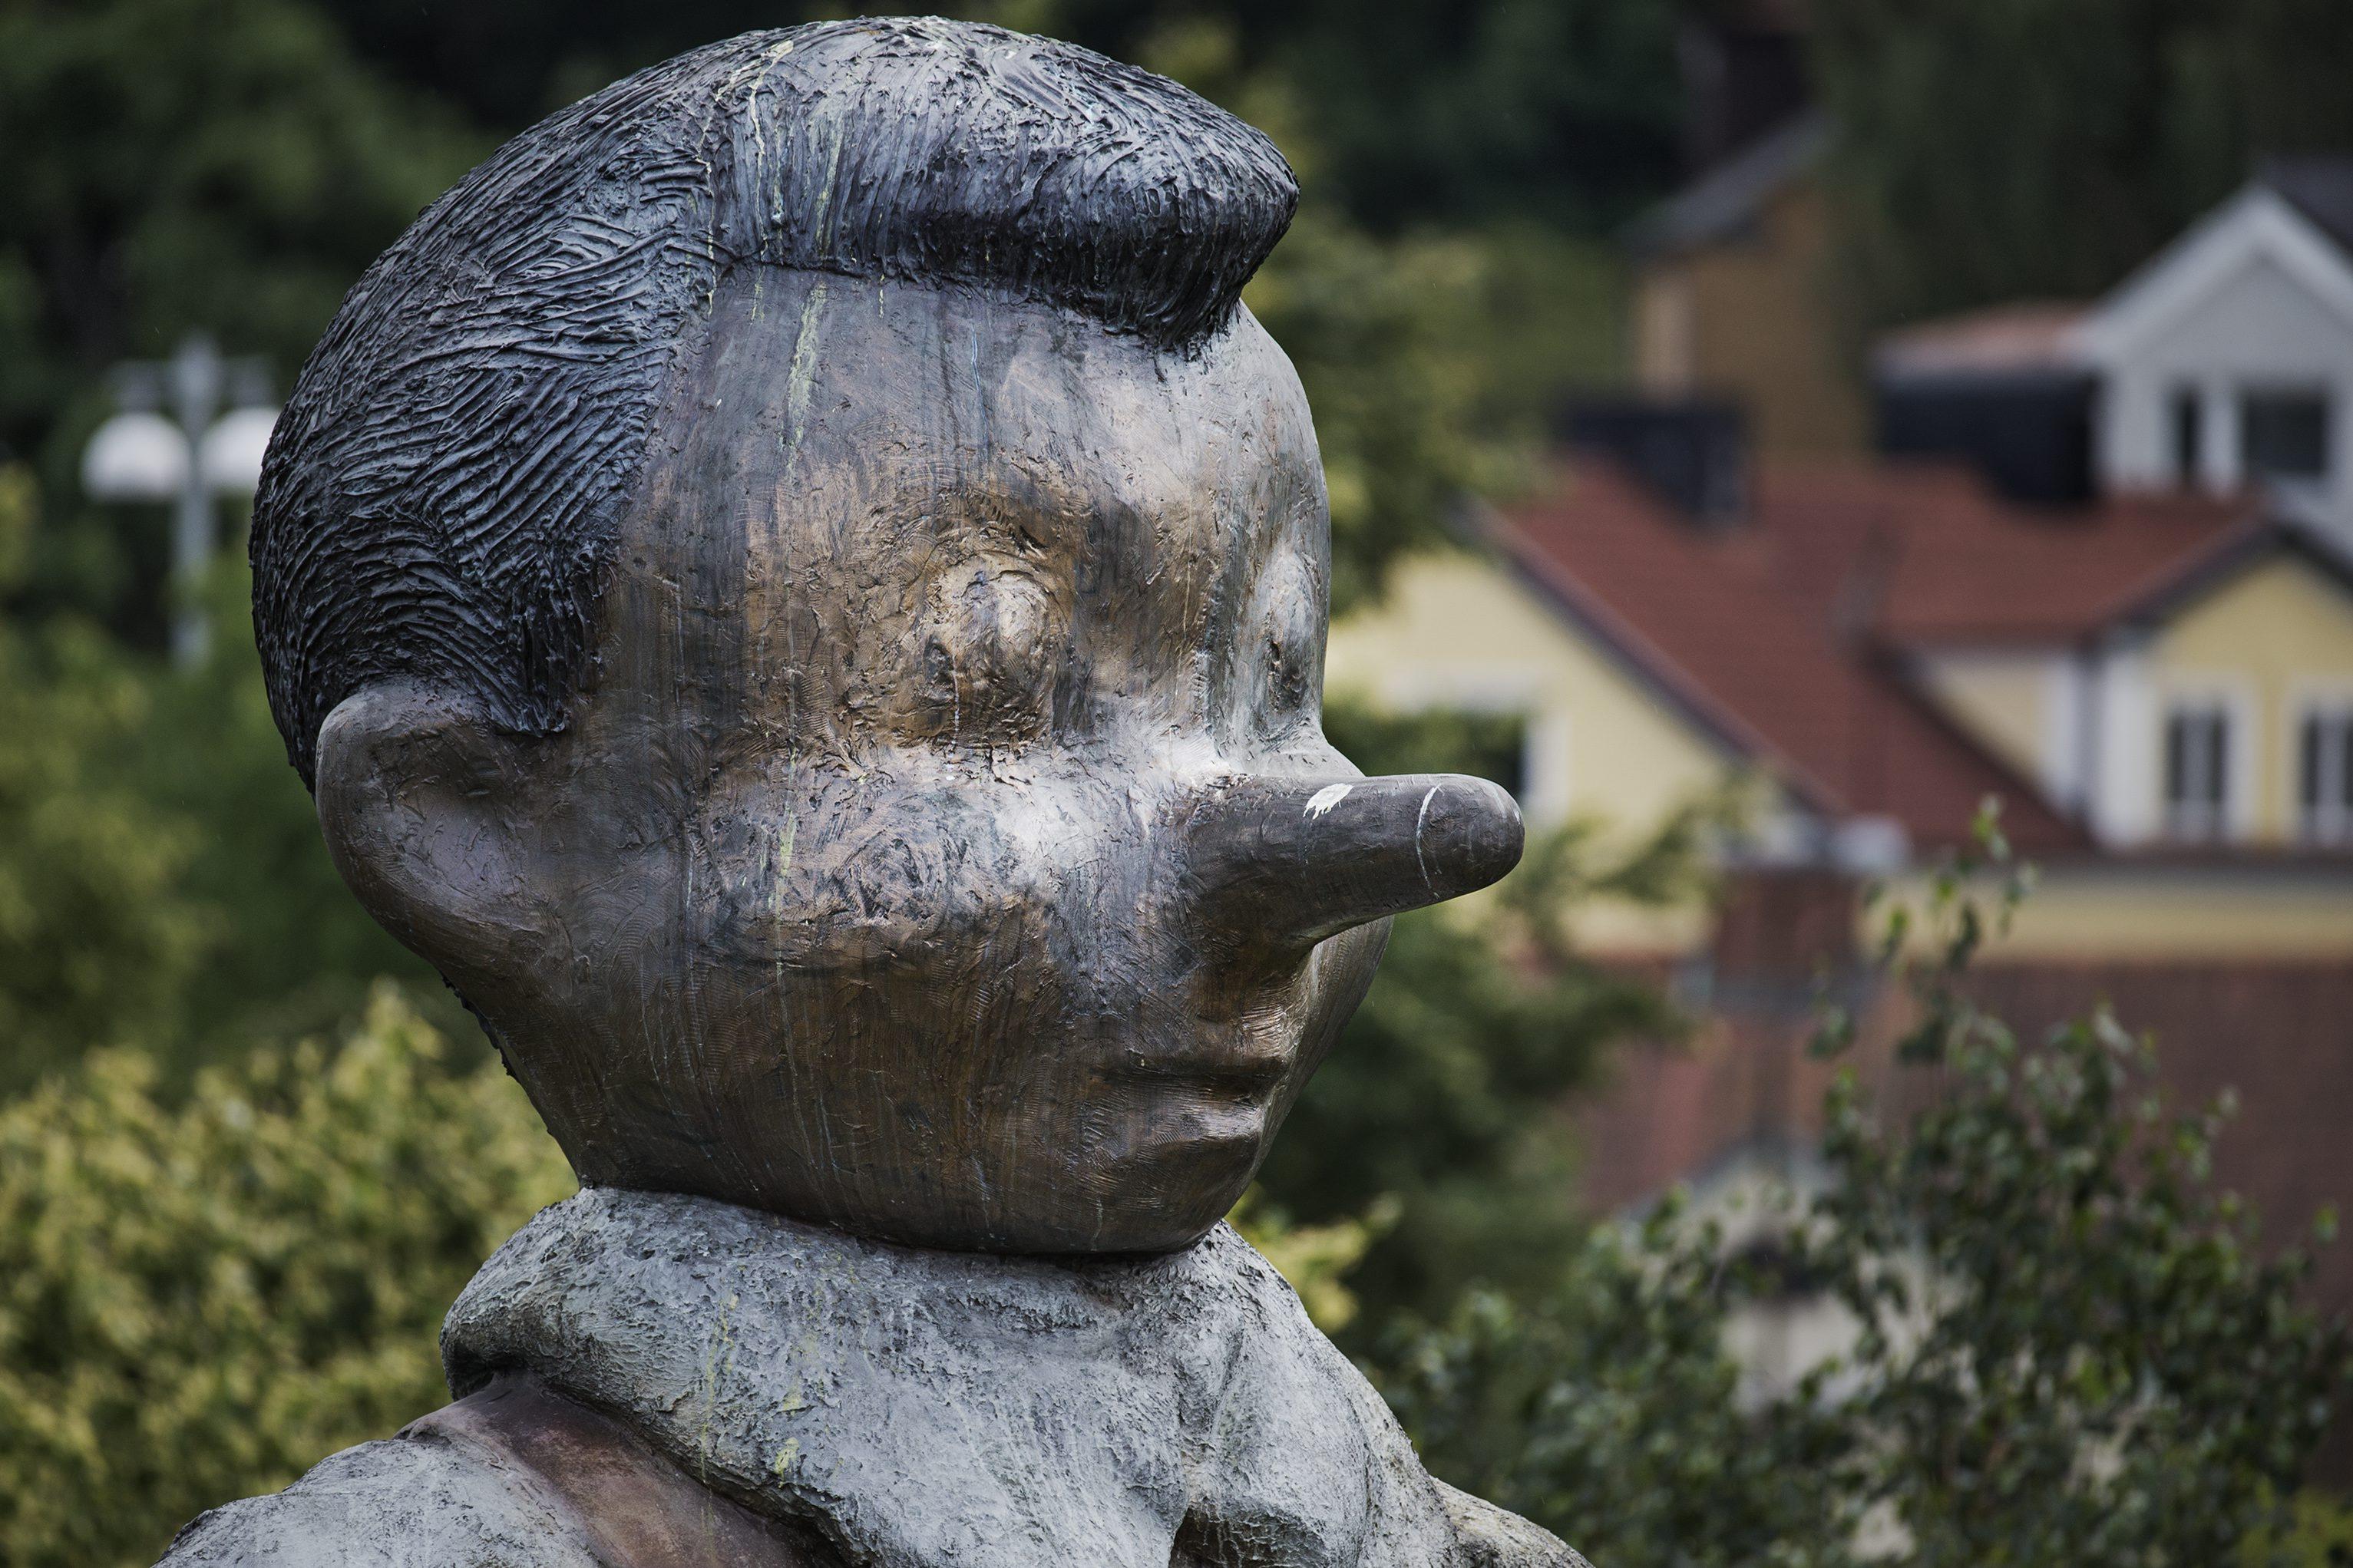 Karta Skulpturer Boras.Darfor Star Pinocchio I Boras Se Var Kartlaggning Boras Tidning